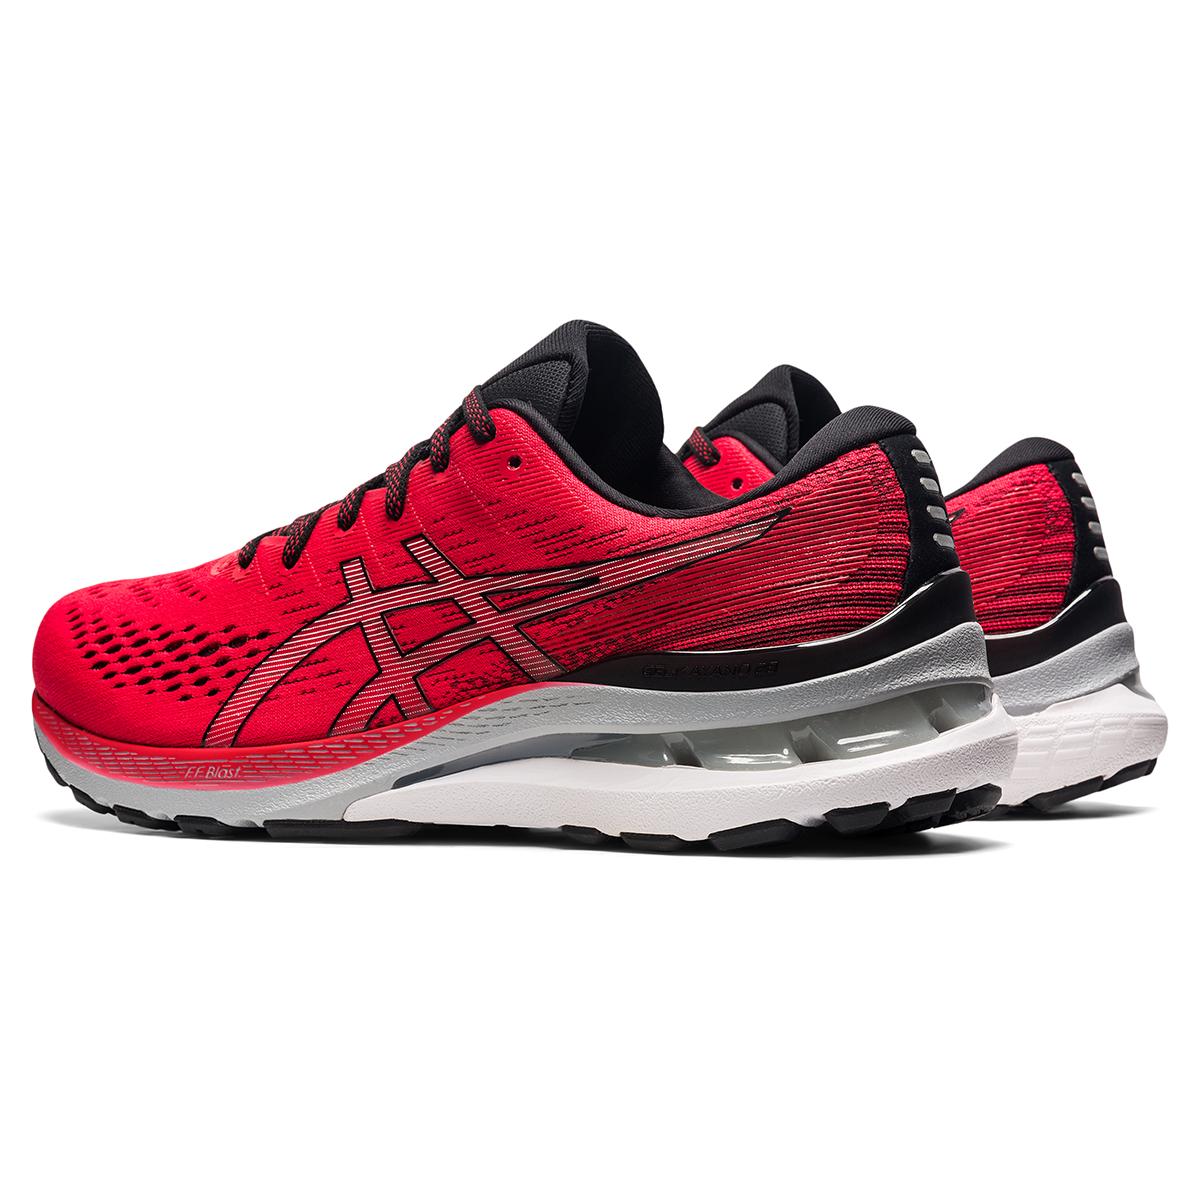 Men's Asics Gel-Kayano 28 Running Shoe - Color: Electric Red - Size: 7 - Width: Regular, Electric Red, large, image 6